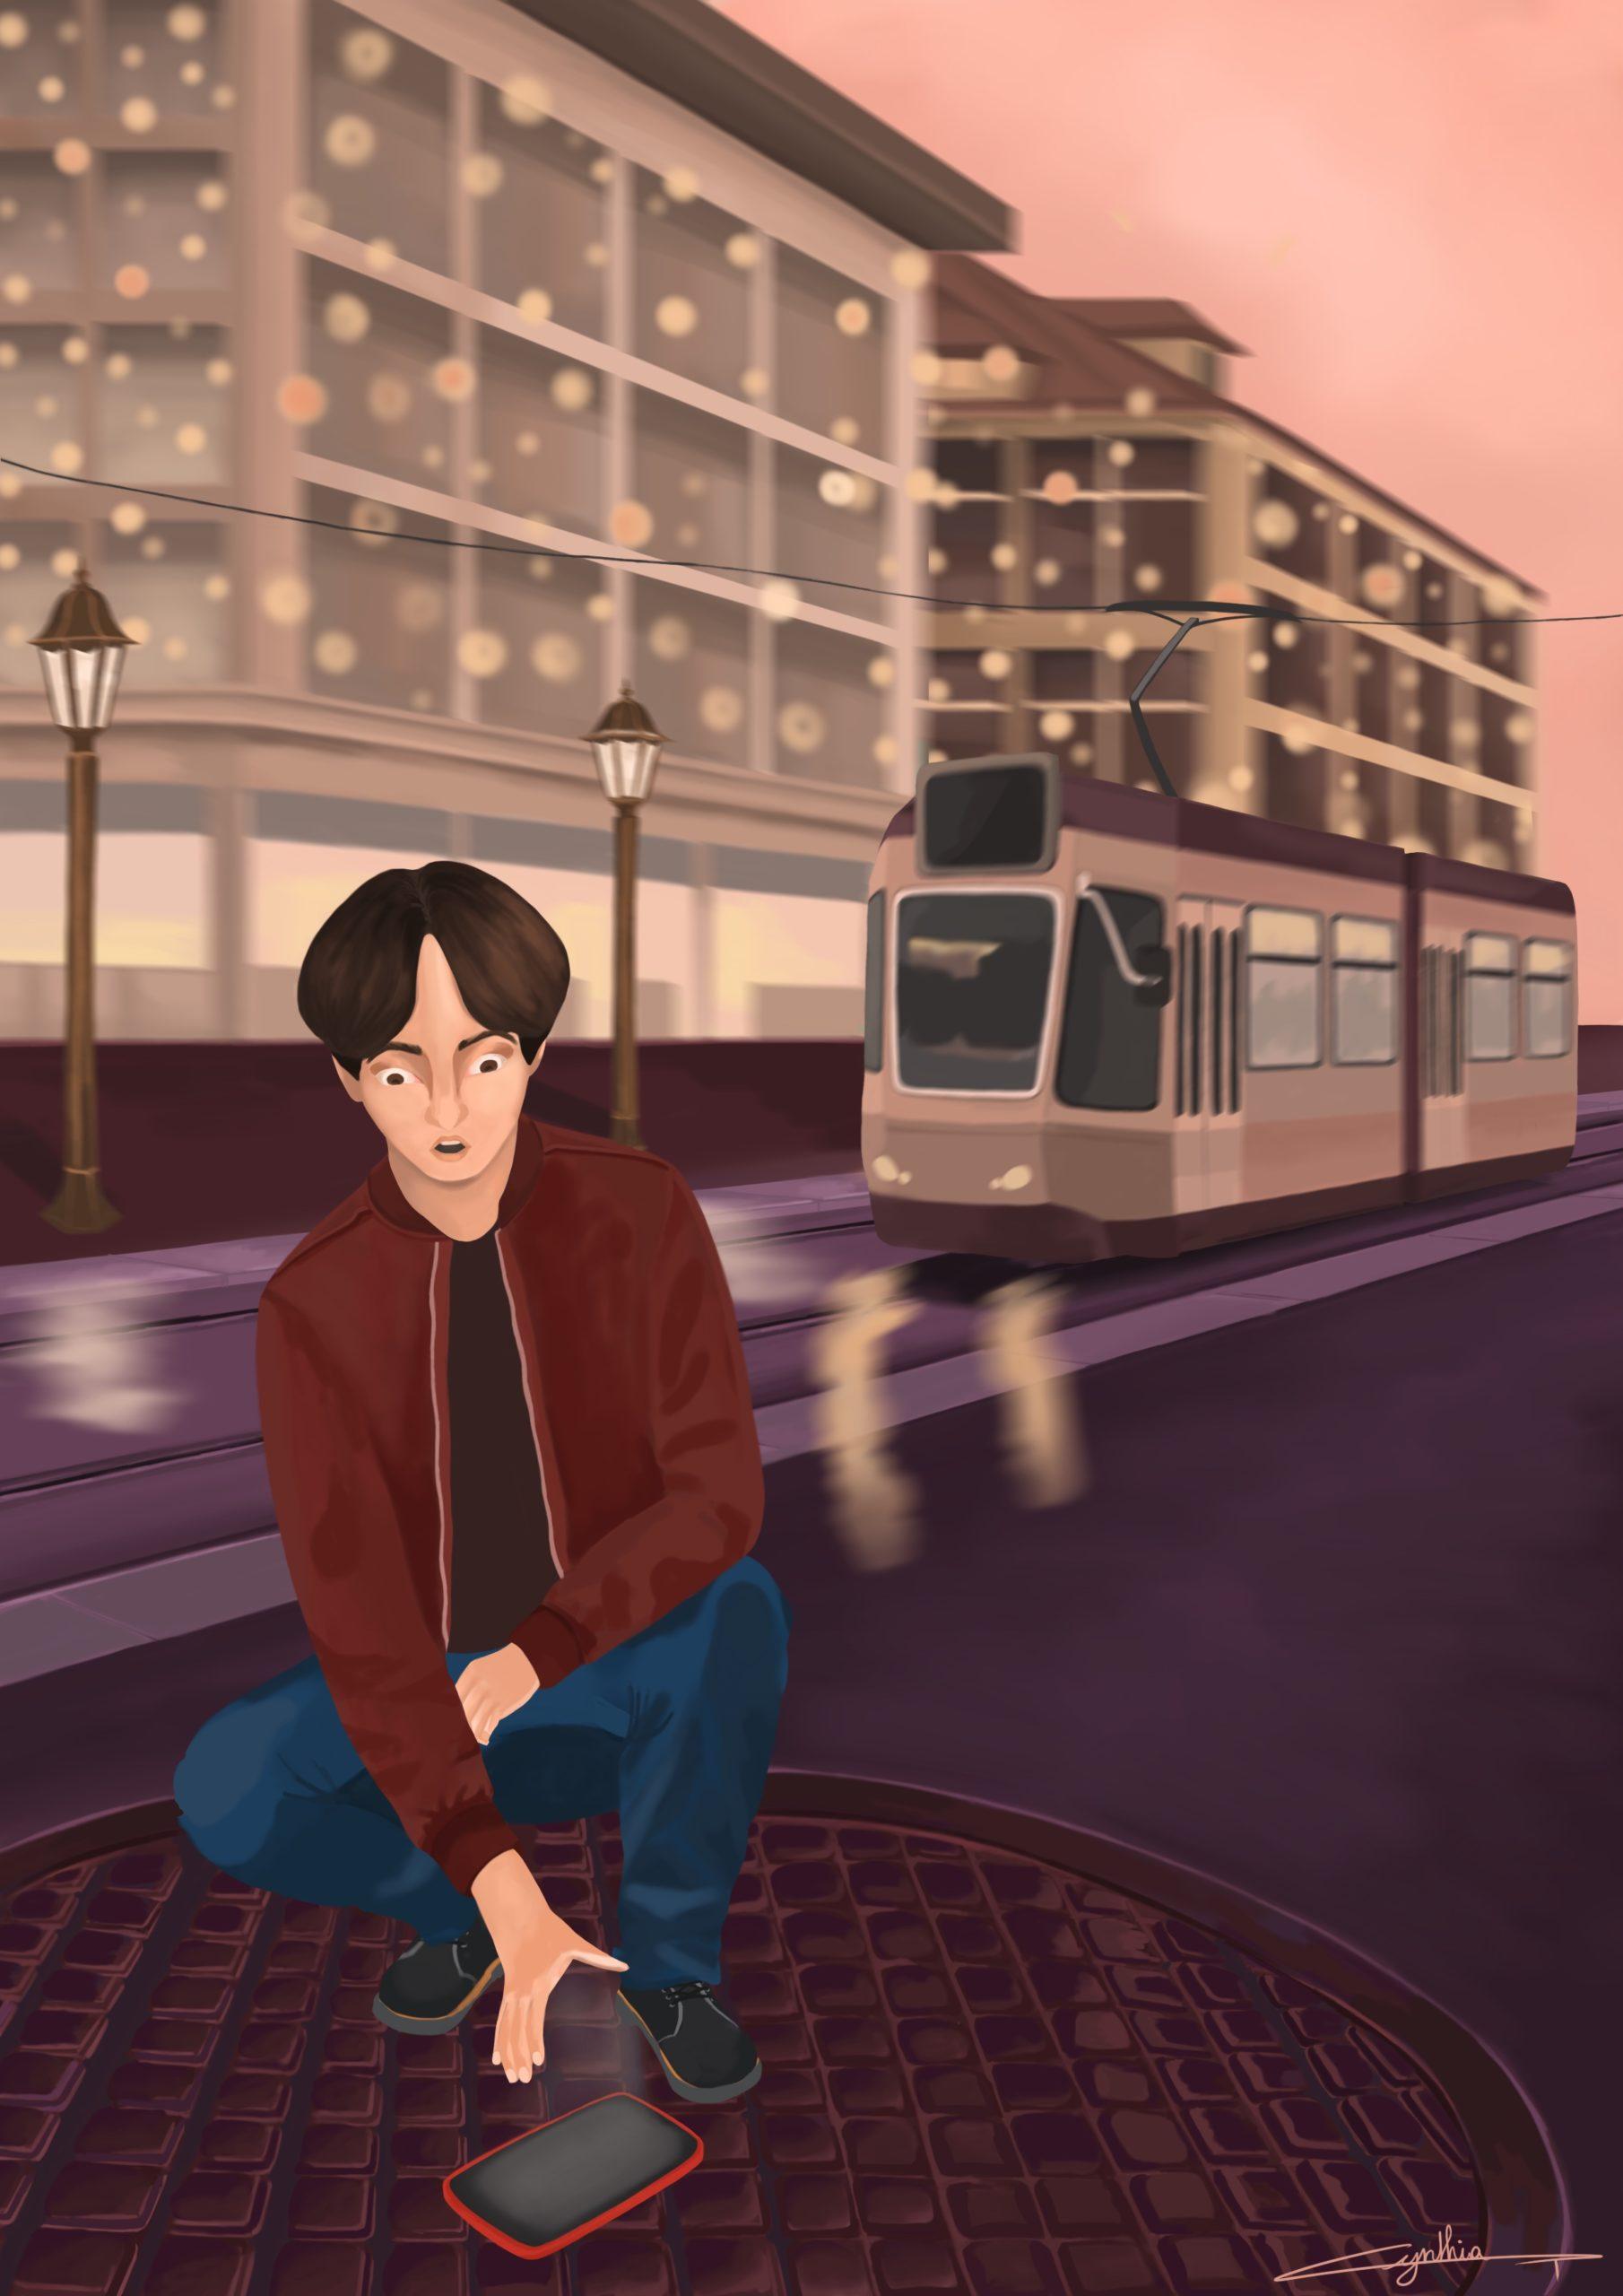 Téléphone perdu illustration jeu vidéo de Cynthia Artstudio